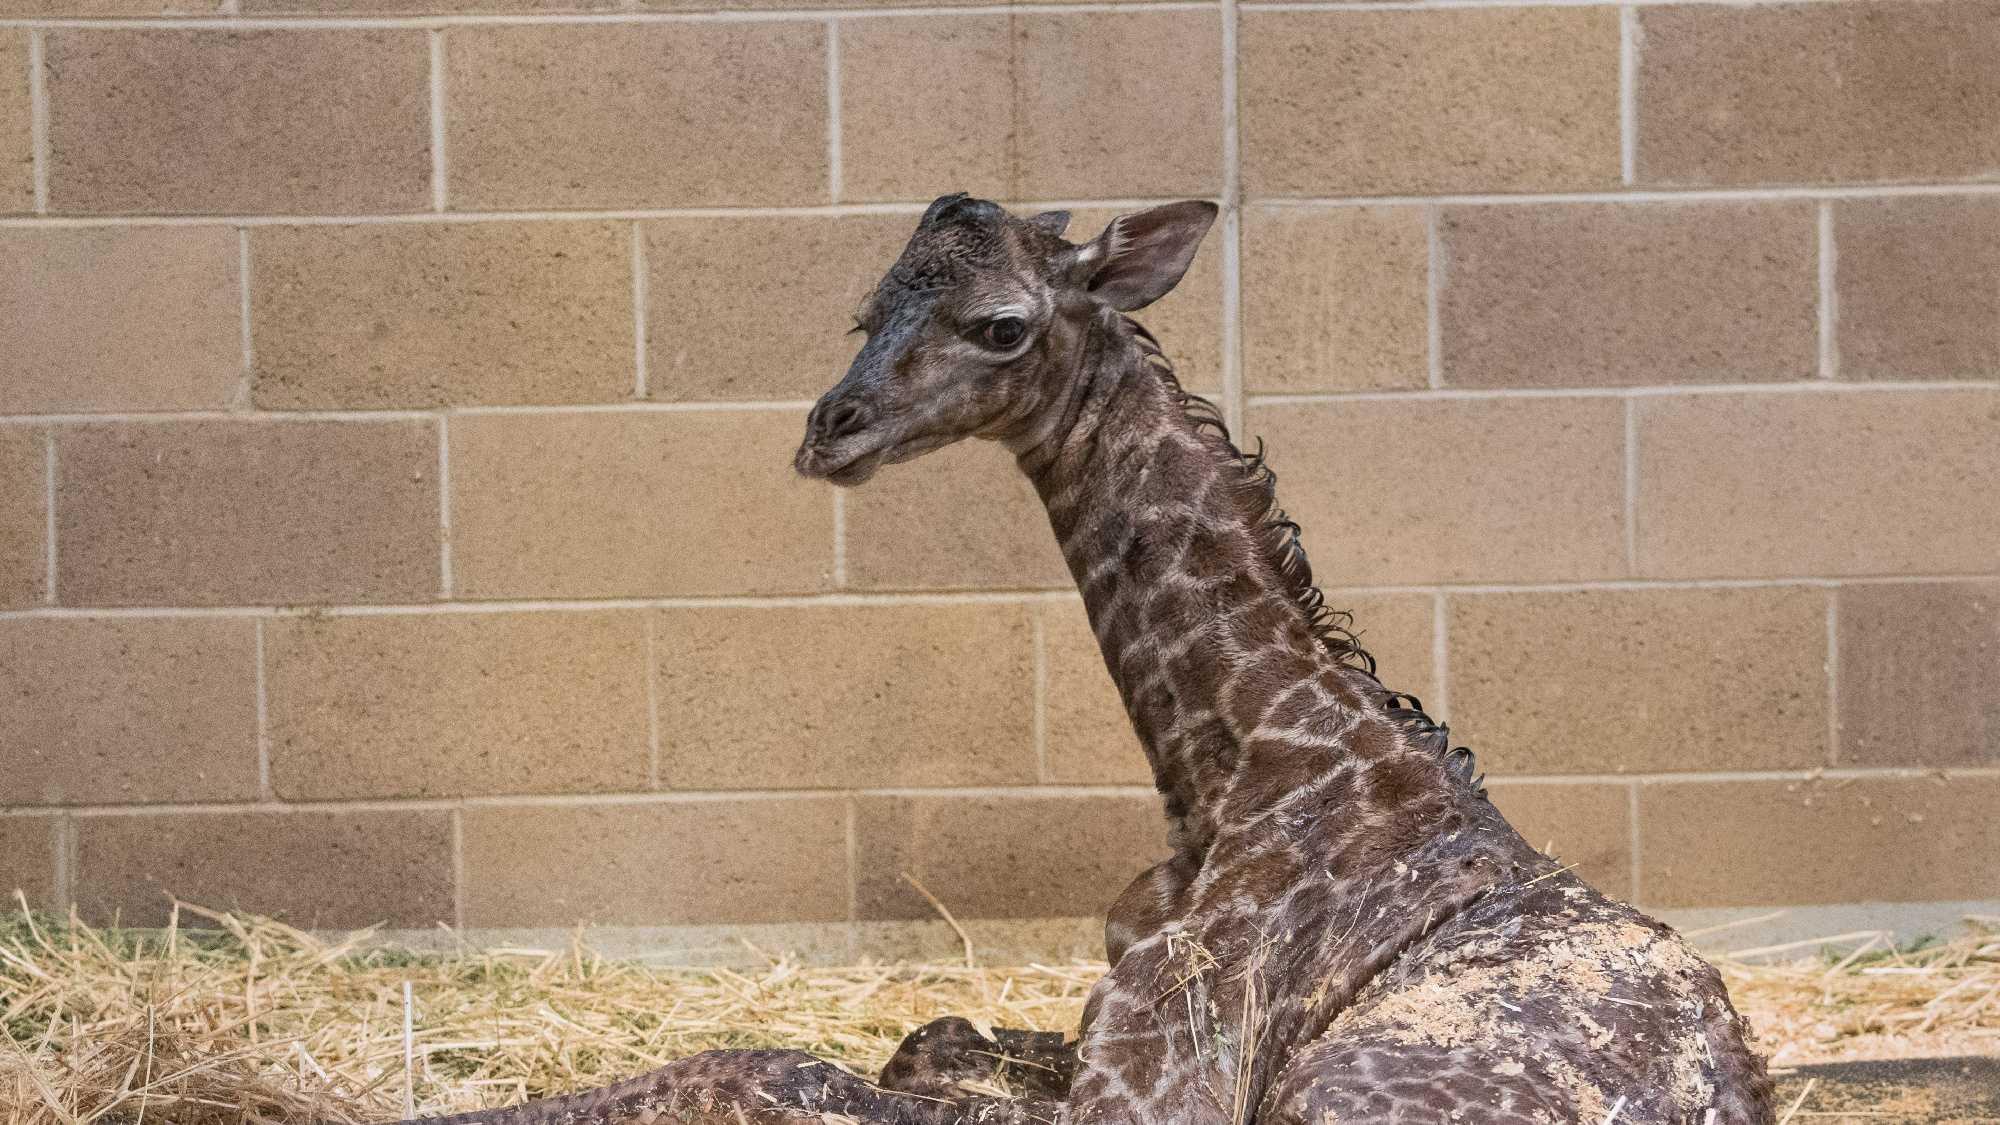 Masai was born at the Sacramento Zoo on Sunday, April 10, 2016.